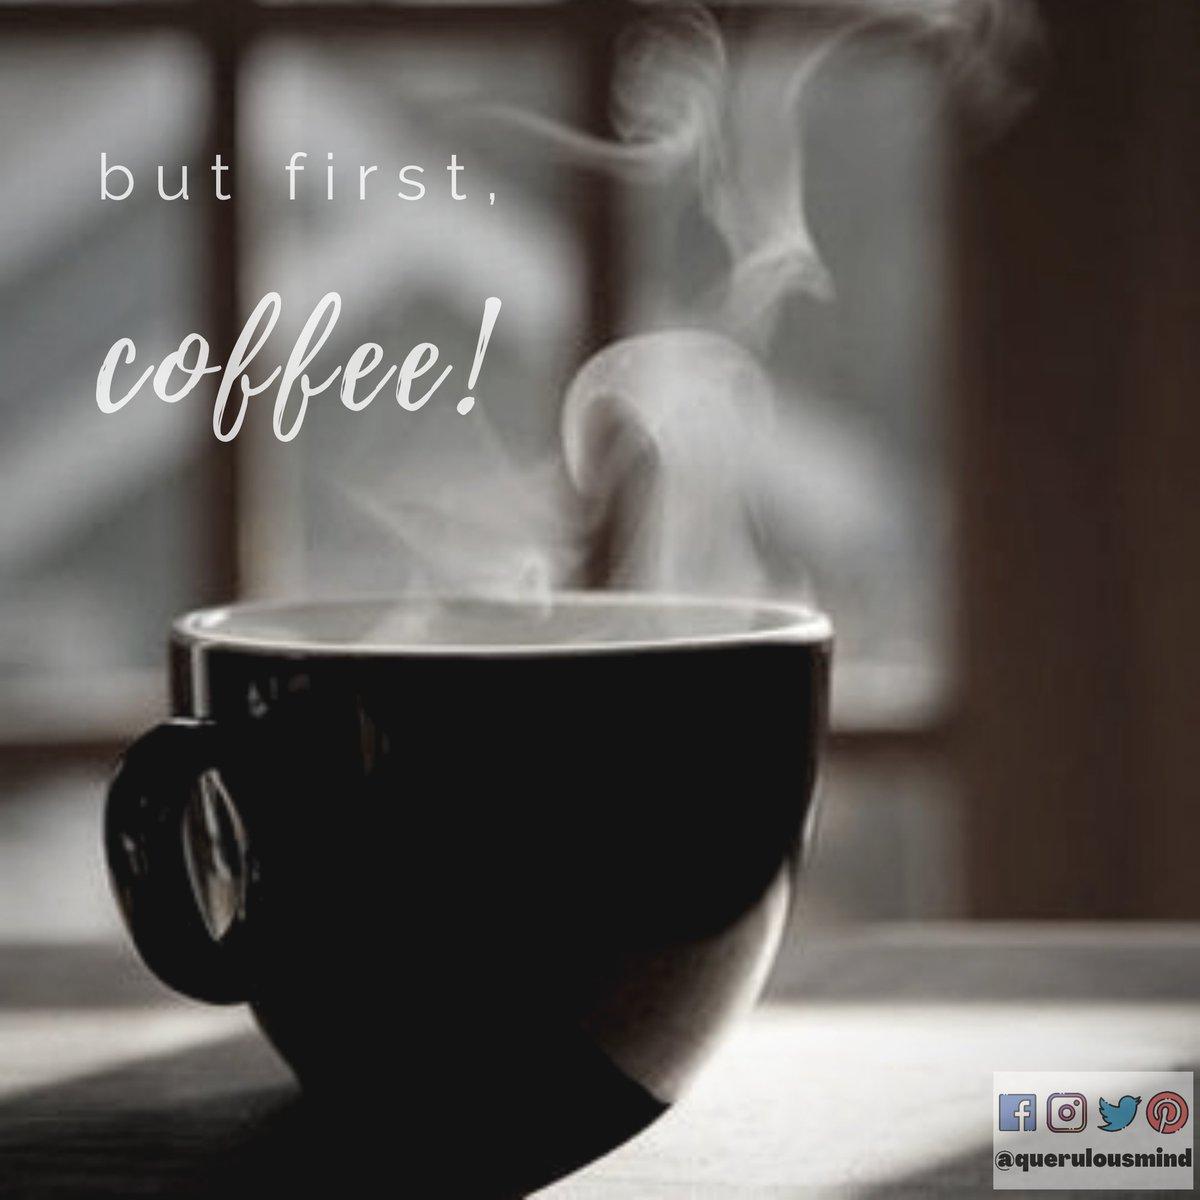 cof·fee (n.) survival juice . . #coffee #coffeelover #coffeeaddict #coffeetime #mondaymotivation #monday #mondaymood #caffeine #coffeephotography #like4likes #likeforlikespic.twitter.com/YCCPzq3N3a